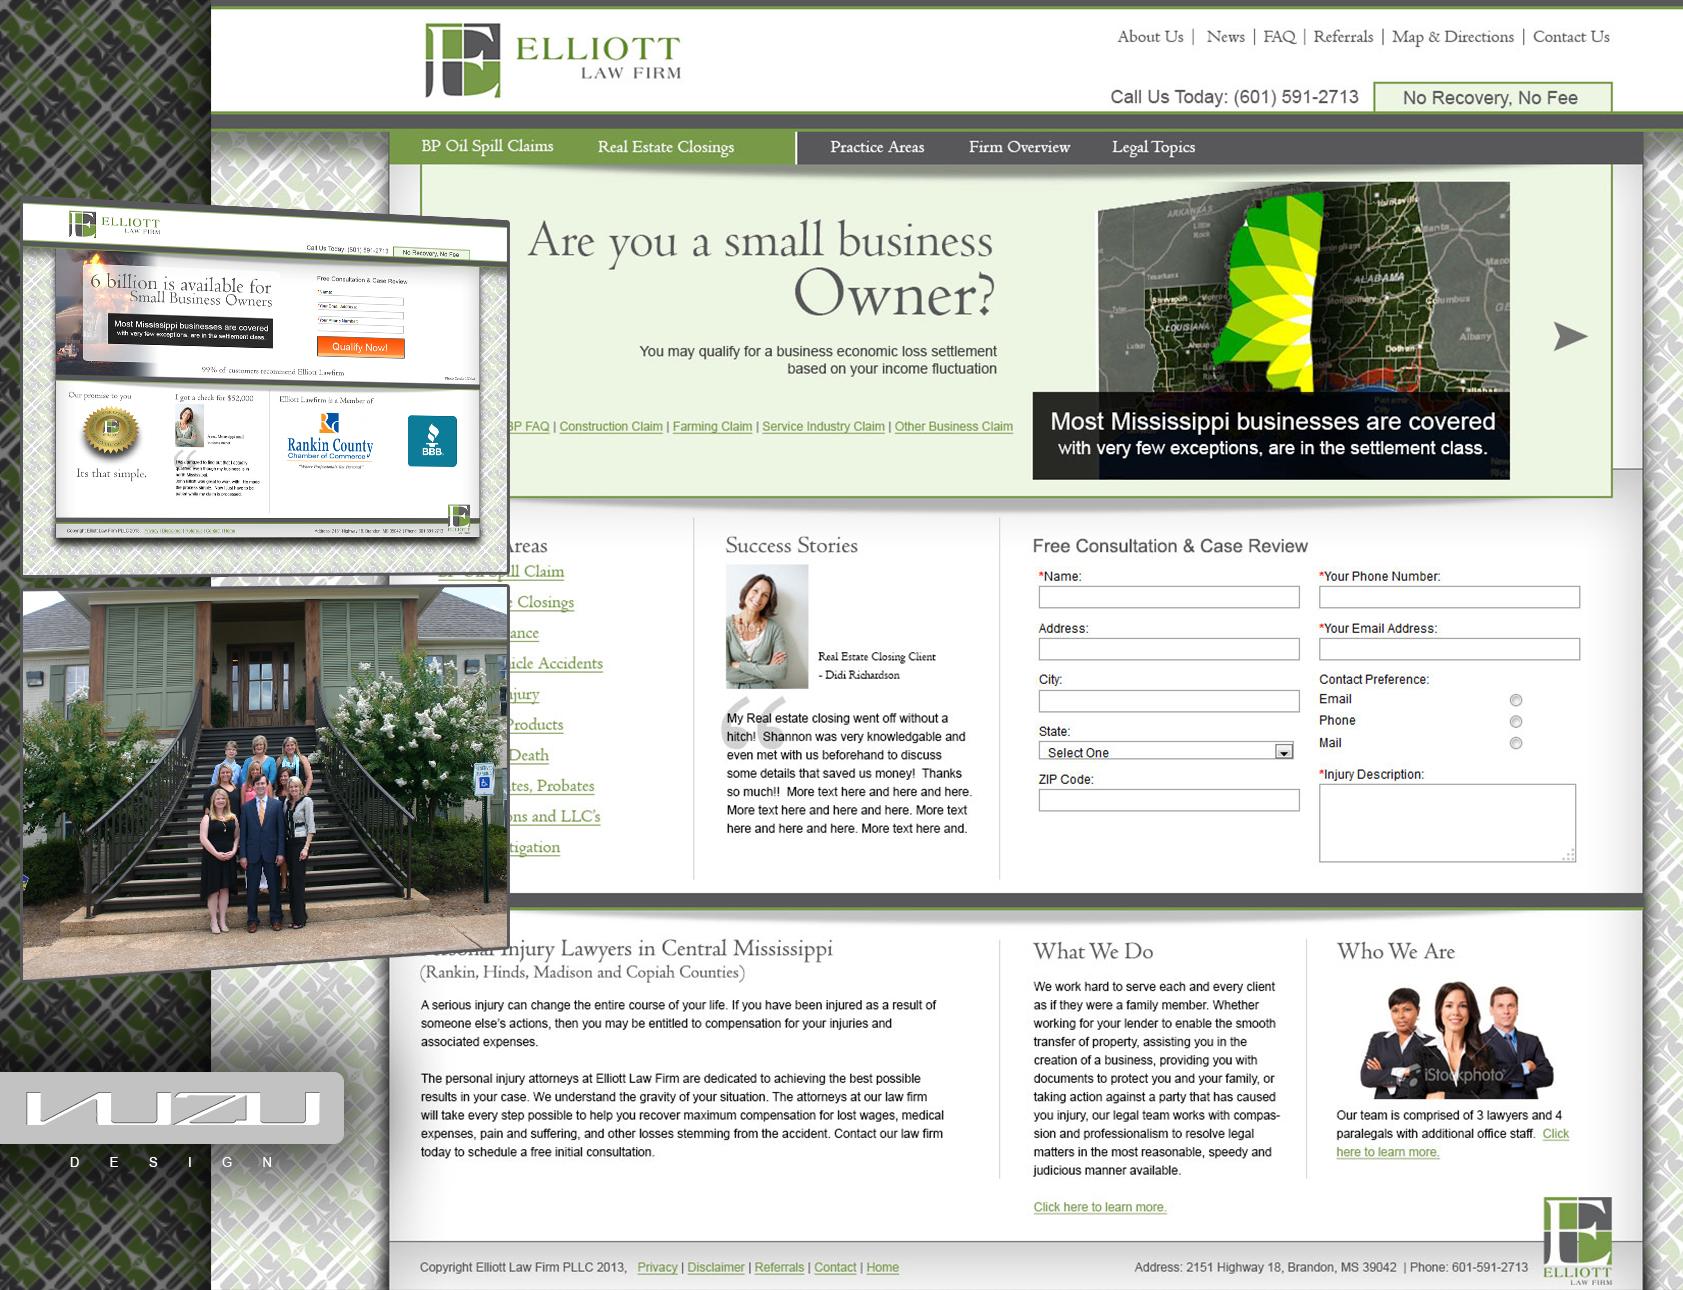 elliott-law-firm web design